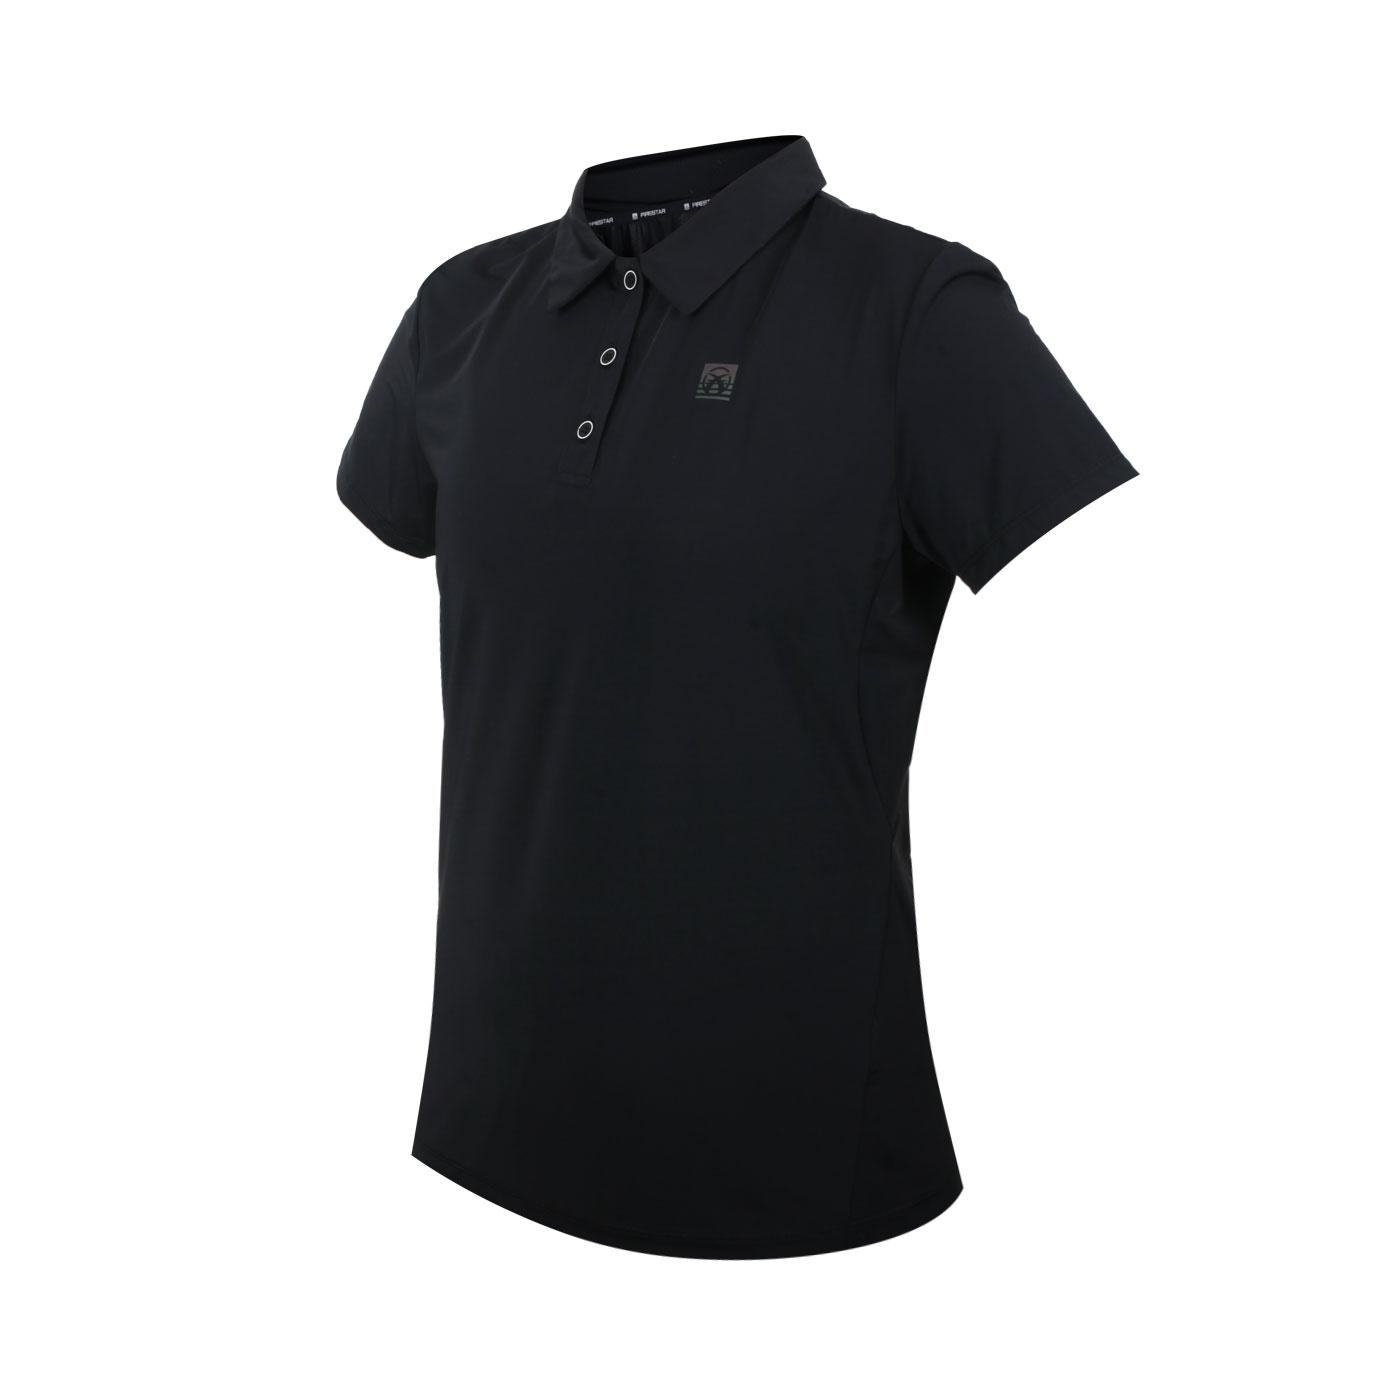 FIRESTAR 女款彈性機能短袖POLO衫 DL168-10